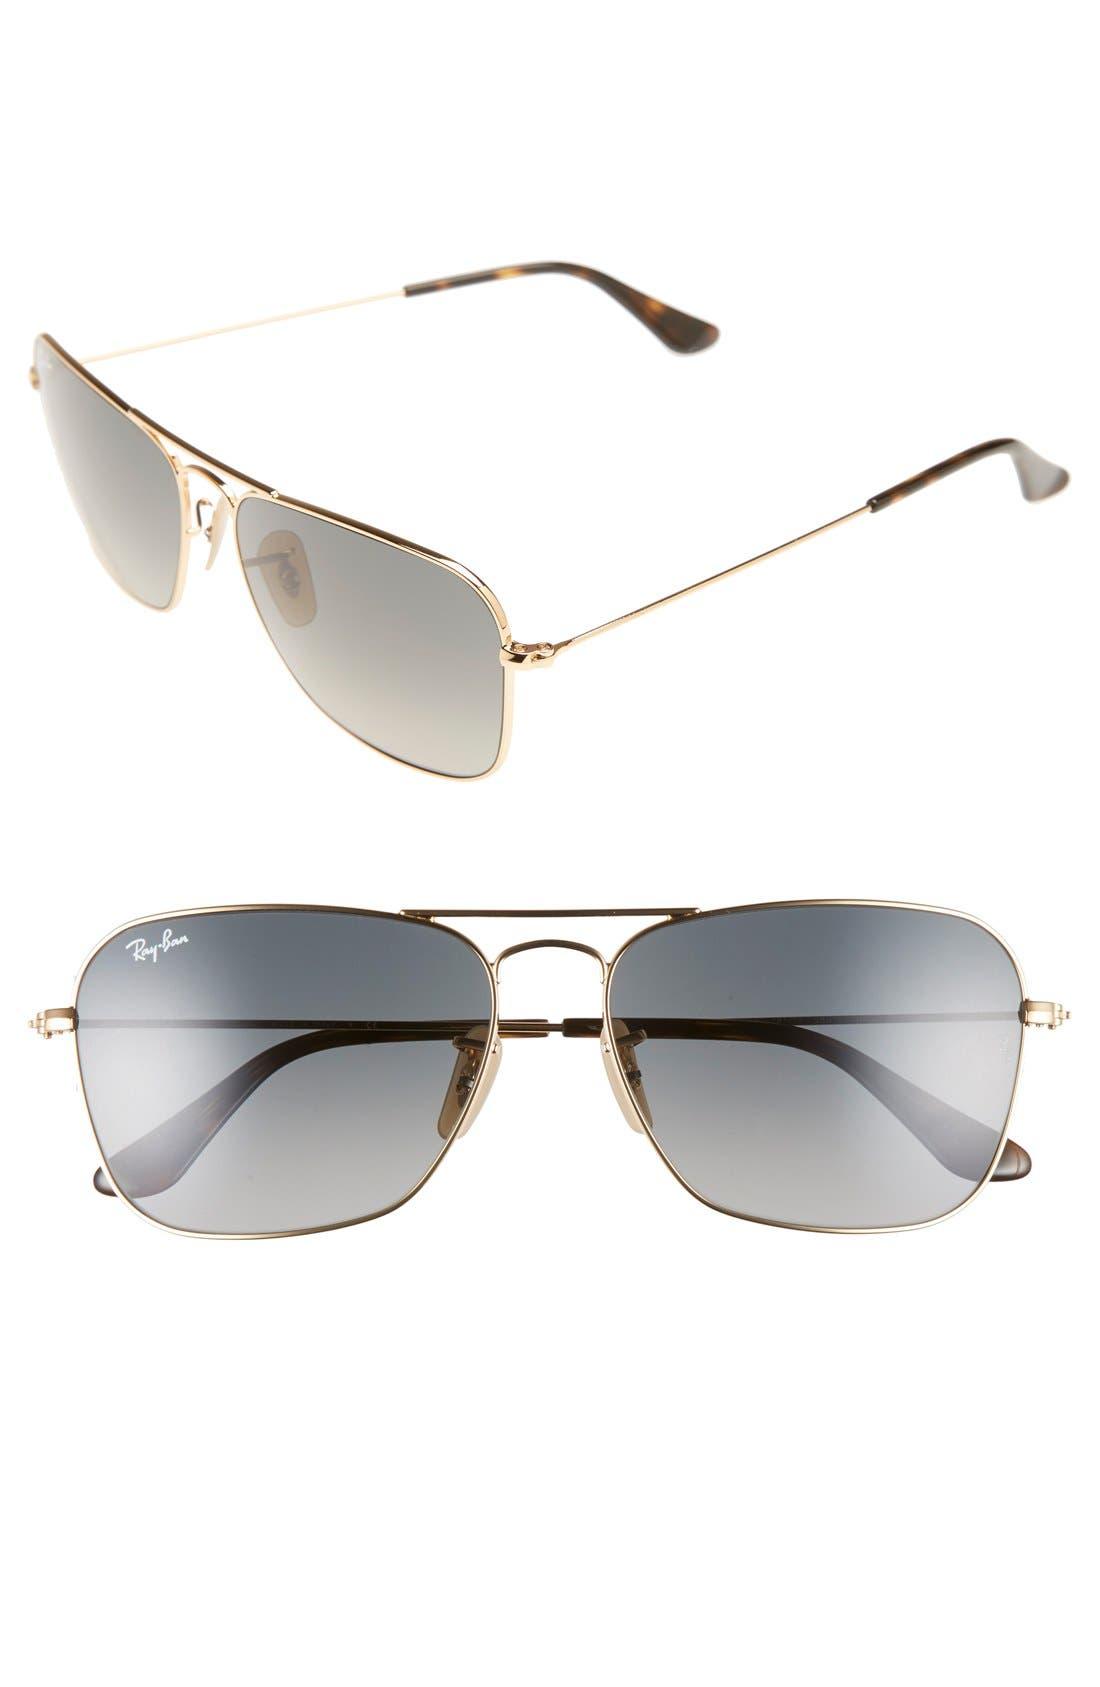 Caravan 58mm Aviator Sunglasses,                             Main thumbnail 1, color,                             Gold/ Grey